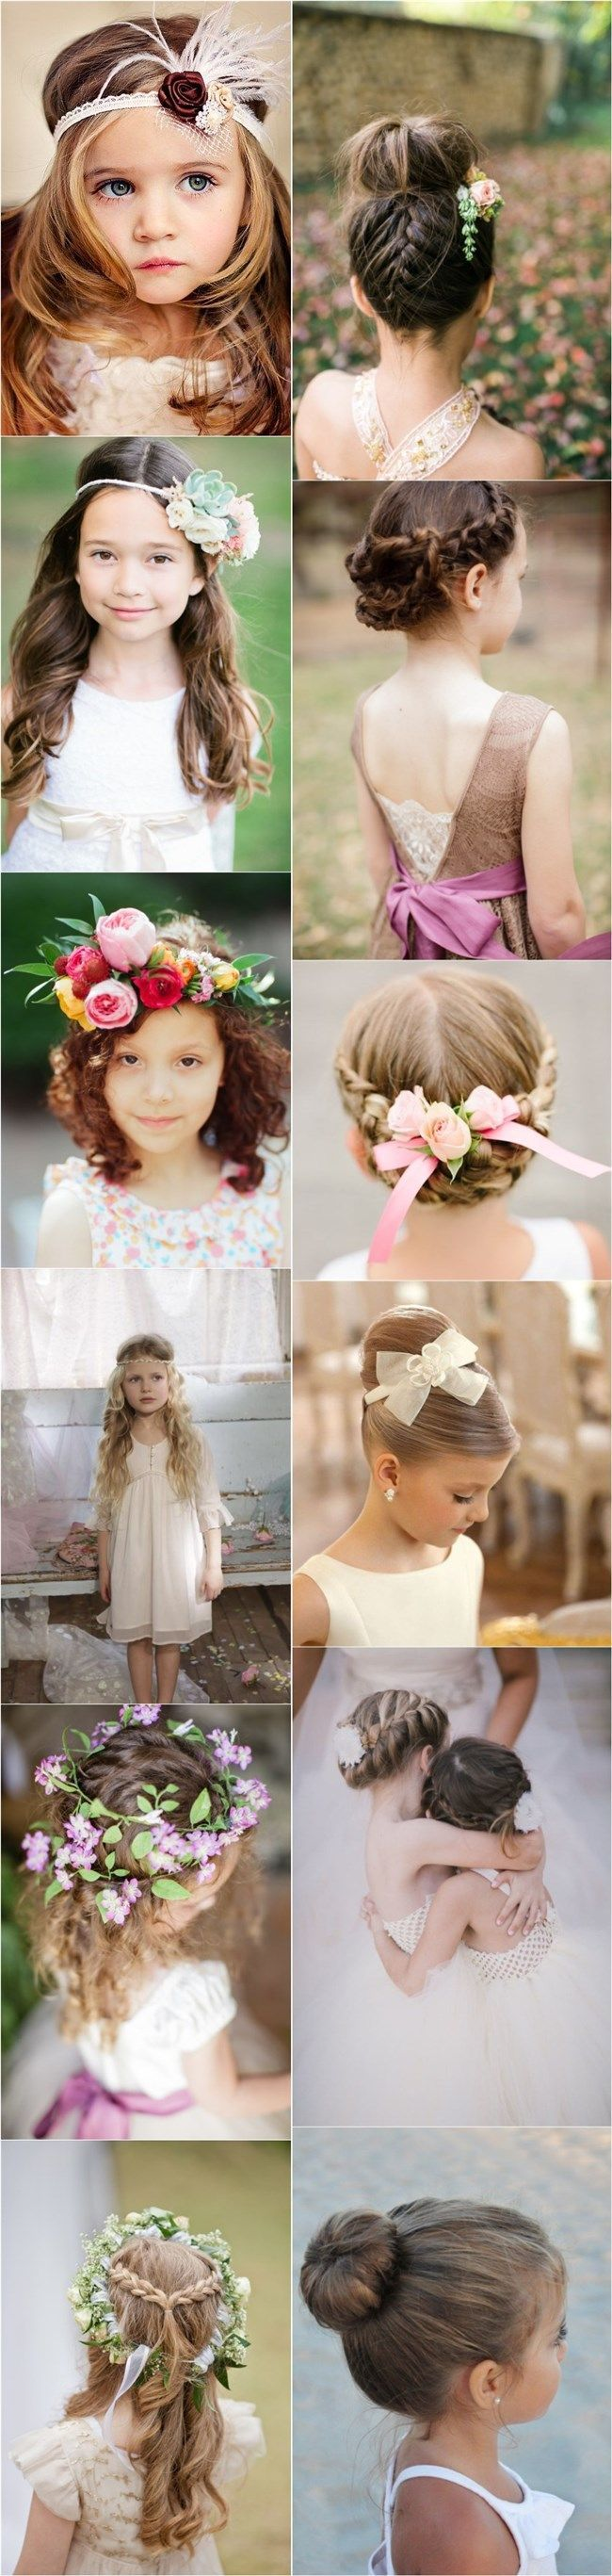 cute little girl hairstyles-updos, braids, waterfall